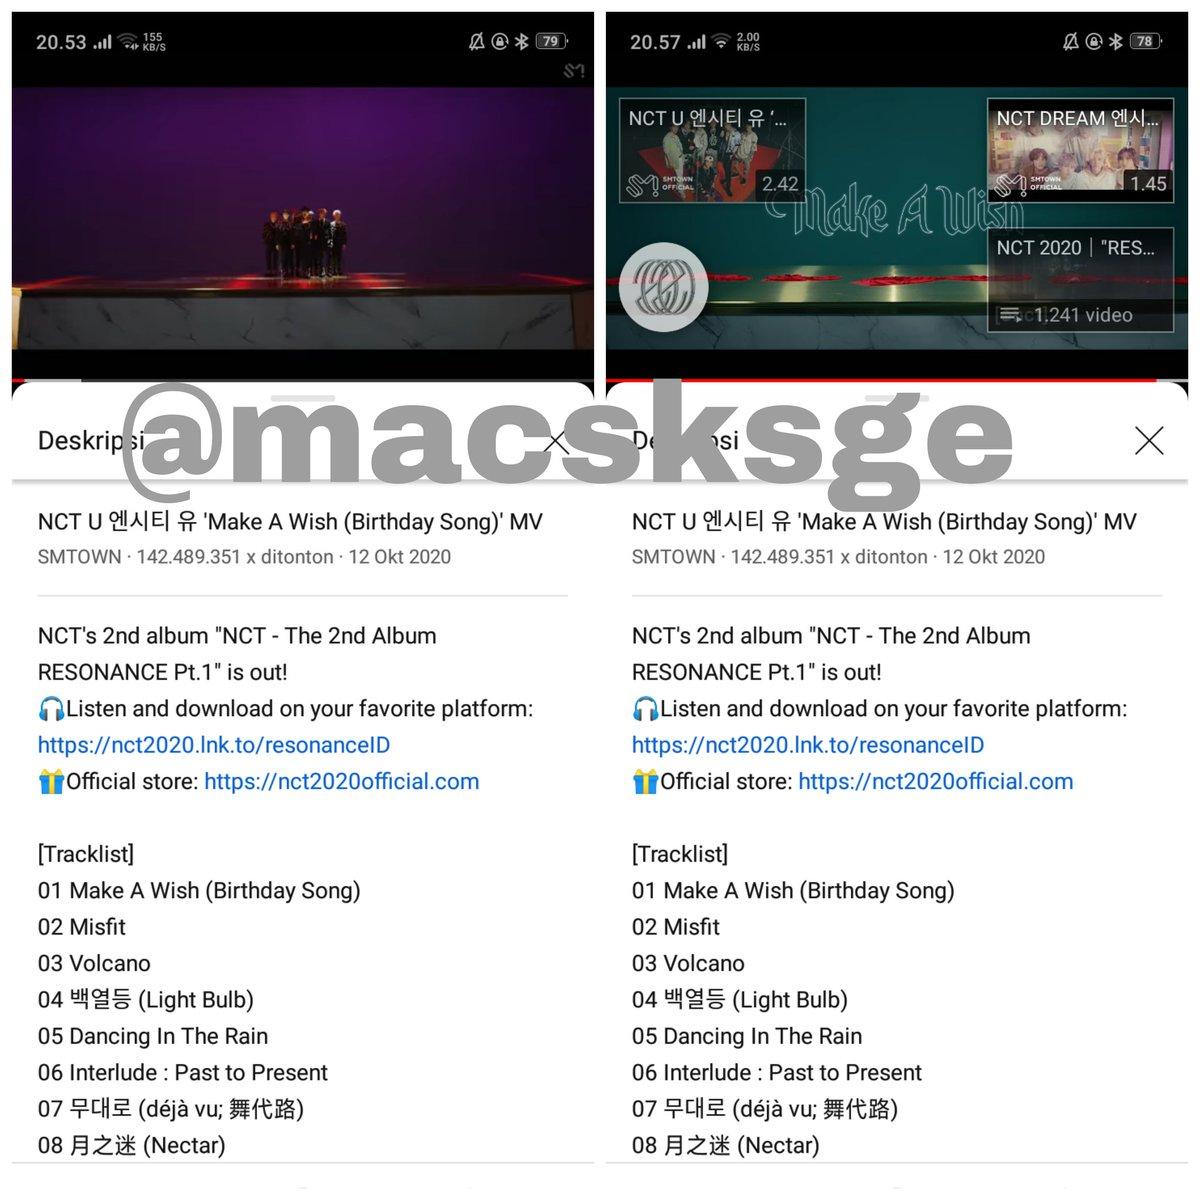 NCT U 'Make A Wish' 📅: Friday, 15.01.2021 🎬: {1-4} —————————————————— ⏰ 20.53 WIB • 📈142.489.351 ⏰ 21.13 WIB • 📈142.497.074 ⏰ 21.51 WIB • 📈142.505.956 ⏰ 22.03 WIB • 📈142.511.512  #MakeAWish #NCT_RESONANCE #NCTU #NCT #NCT2020